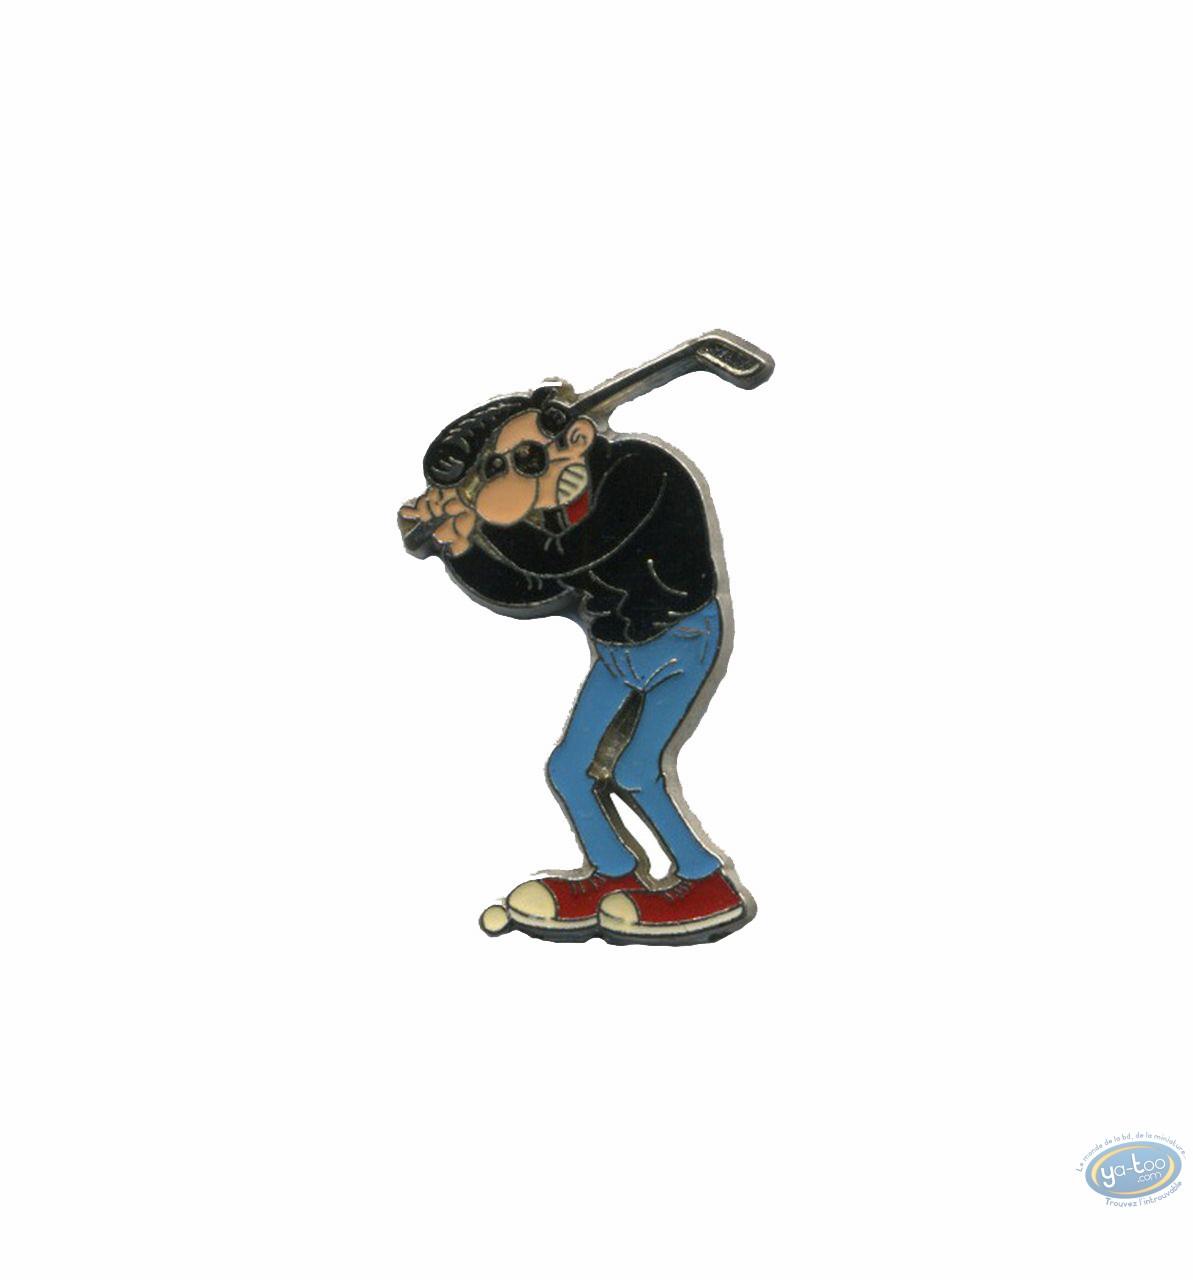 Pin's, Lucien : Lucien plays golf